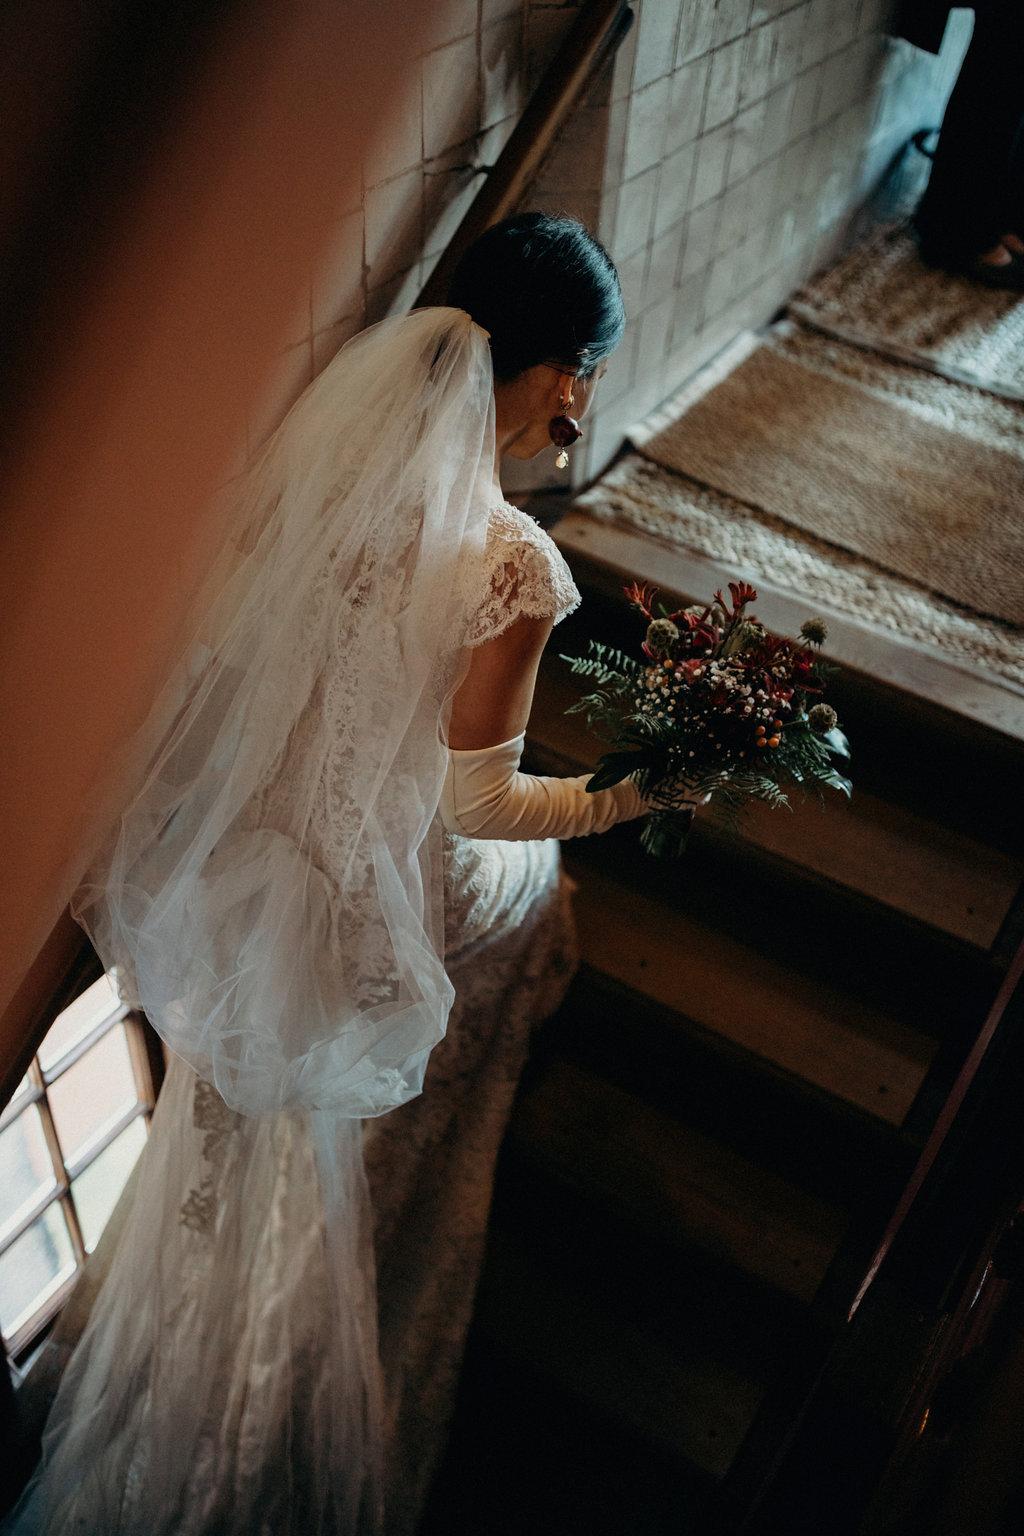 149-sjoerdbooijphotography-wedding-coen-janaina.jpg